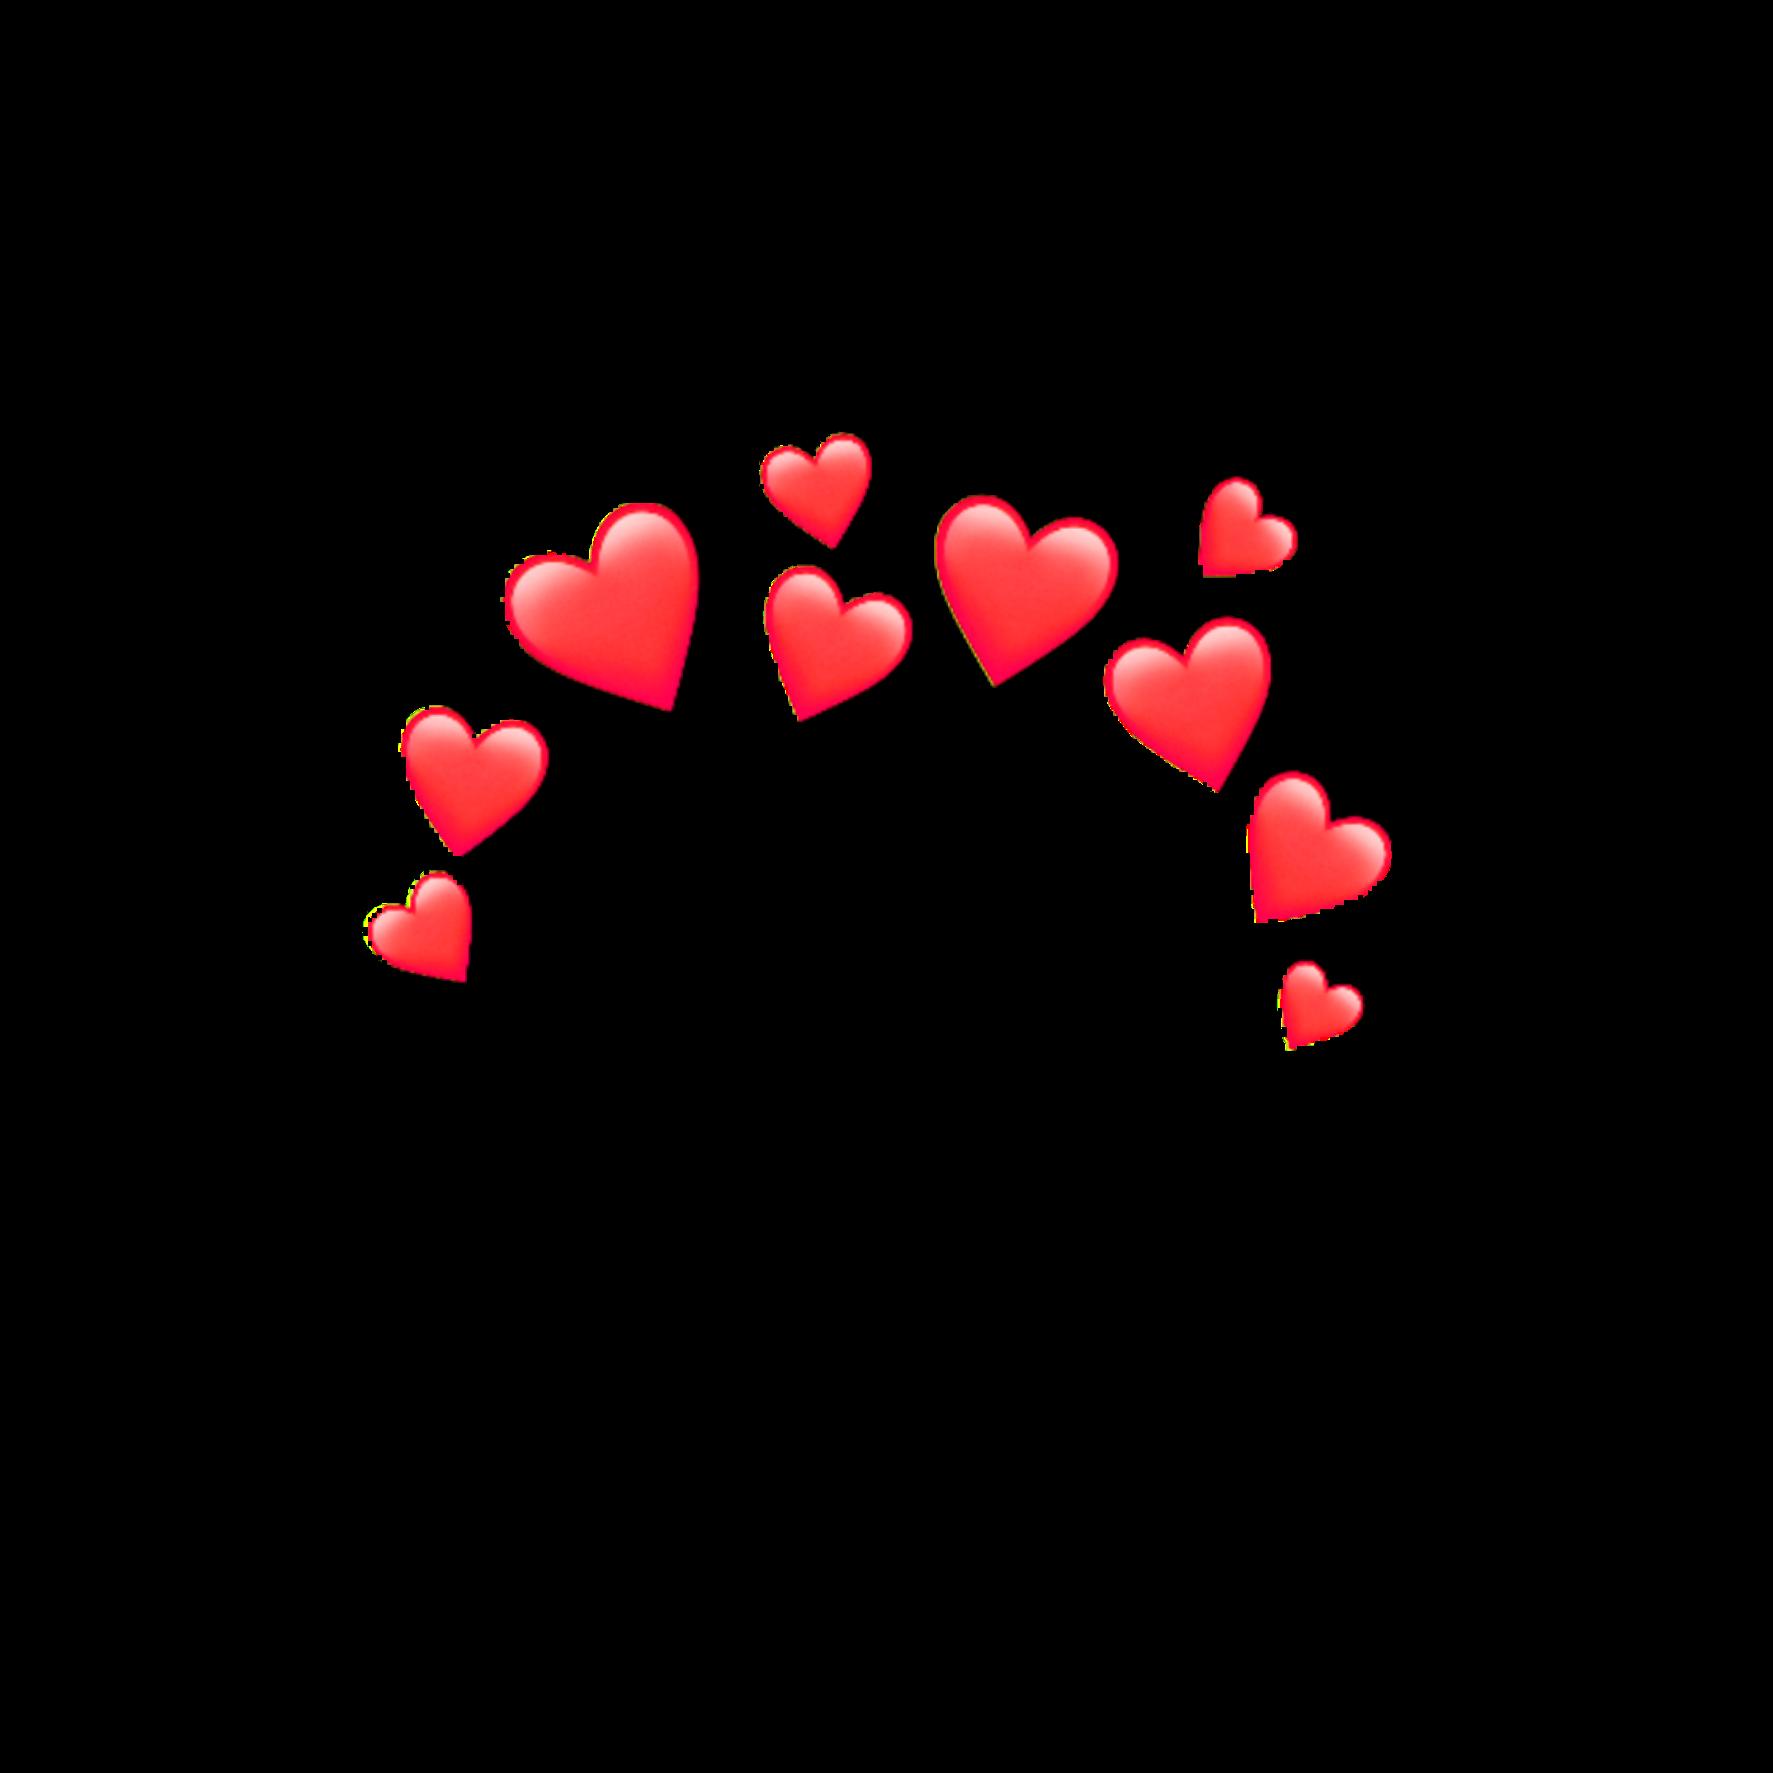 Red Heart Heartcrown Crown Emoji Iphone Random